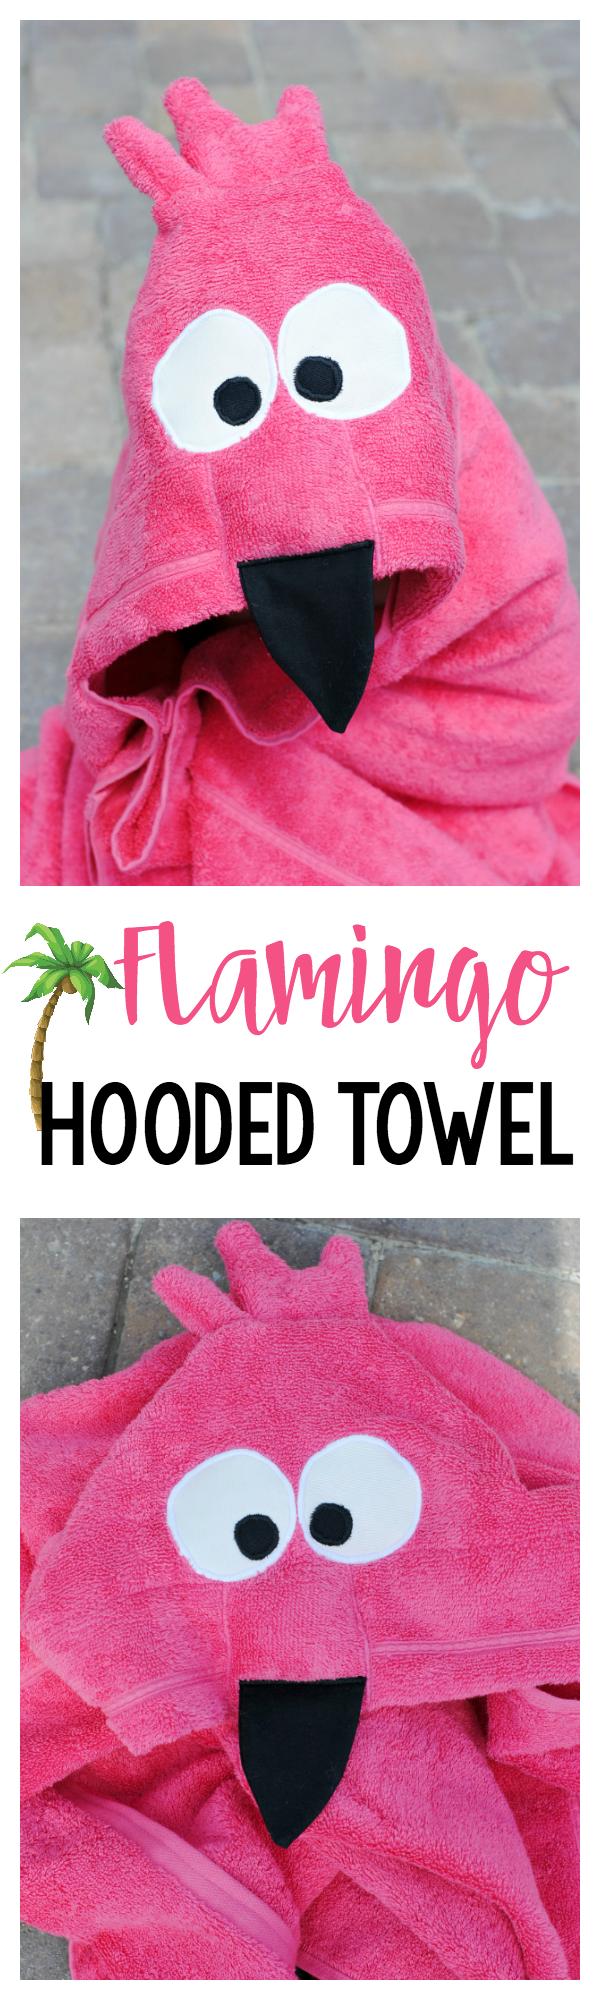 Flamingo Hooded Towel Pattern